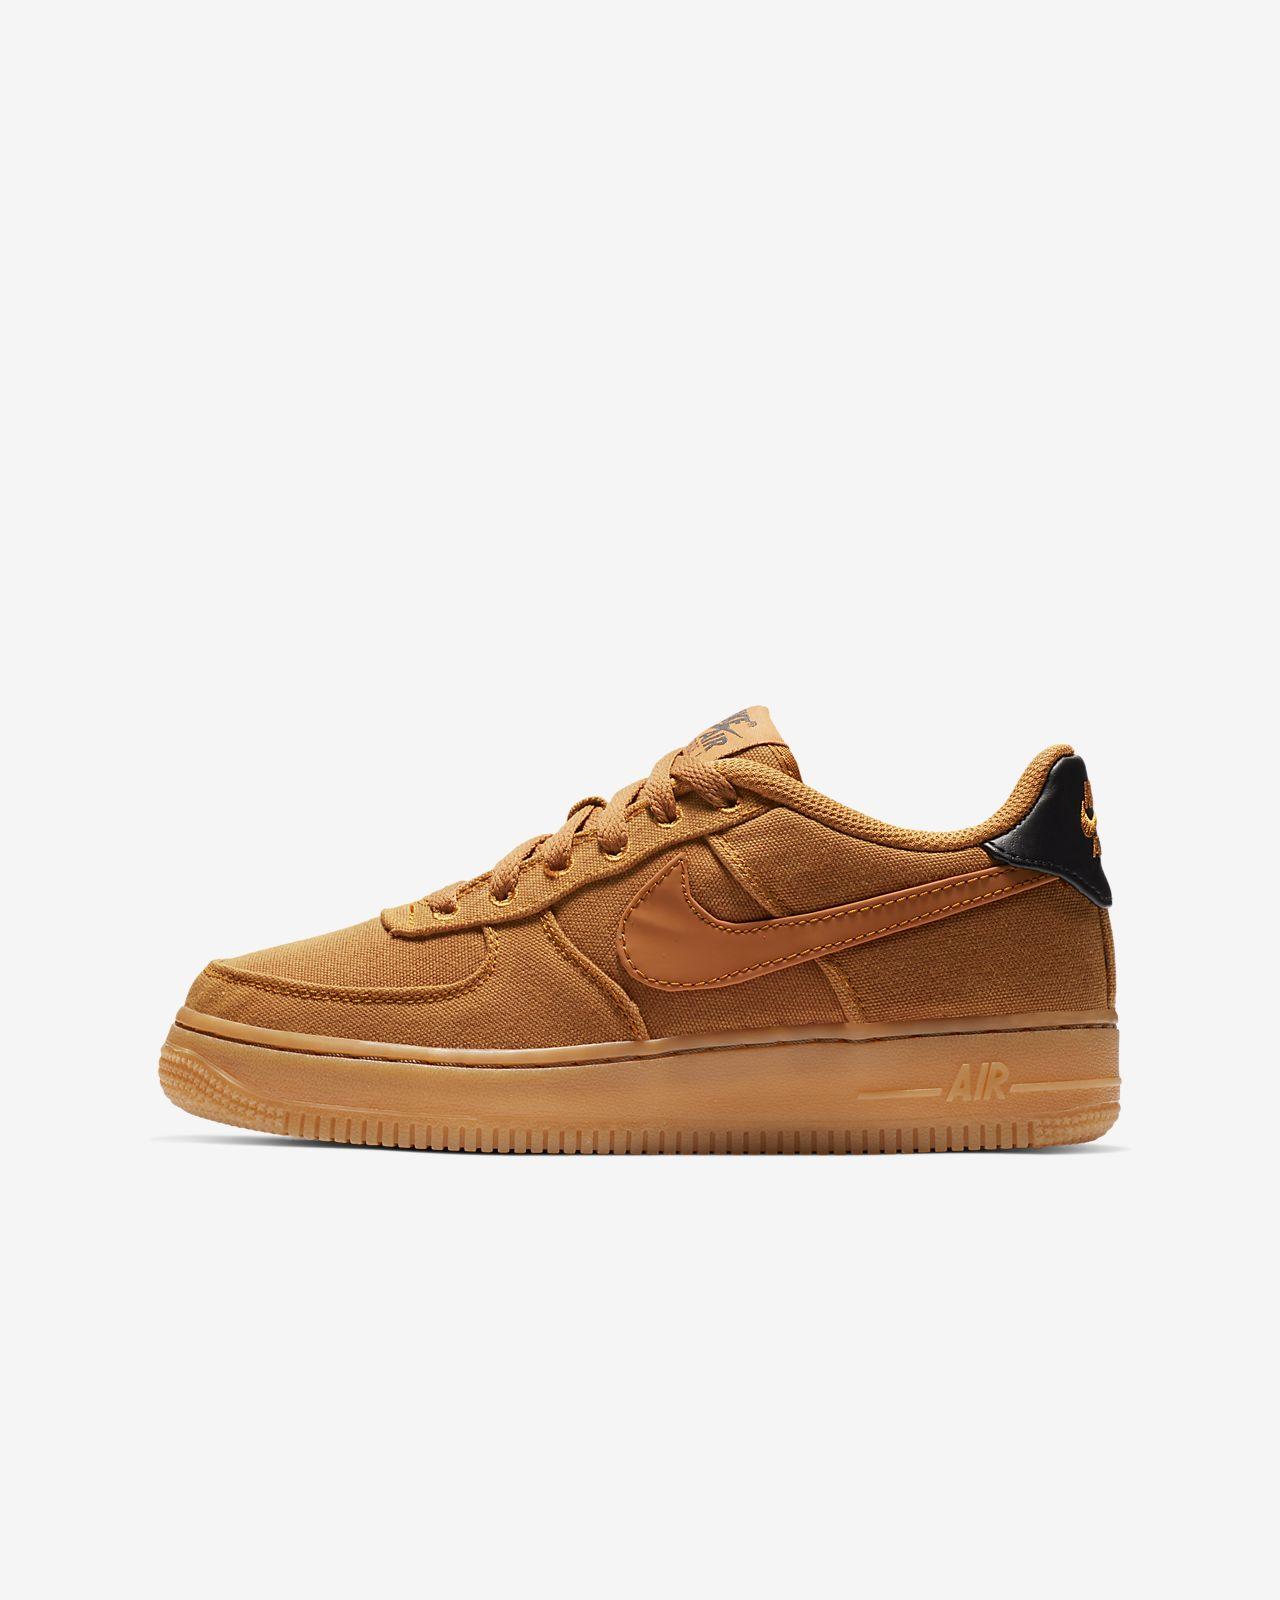 Nike Air Force 1 LV8 Style Big Kids' Shoe